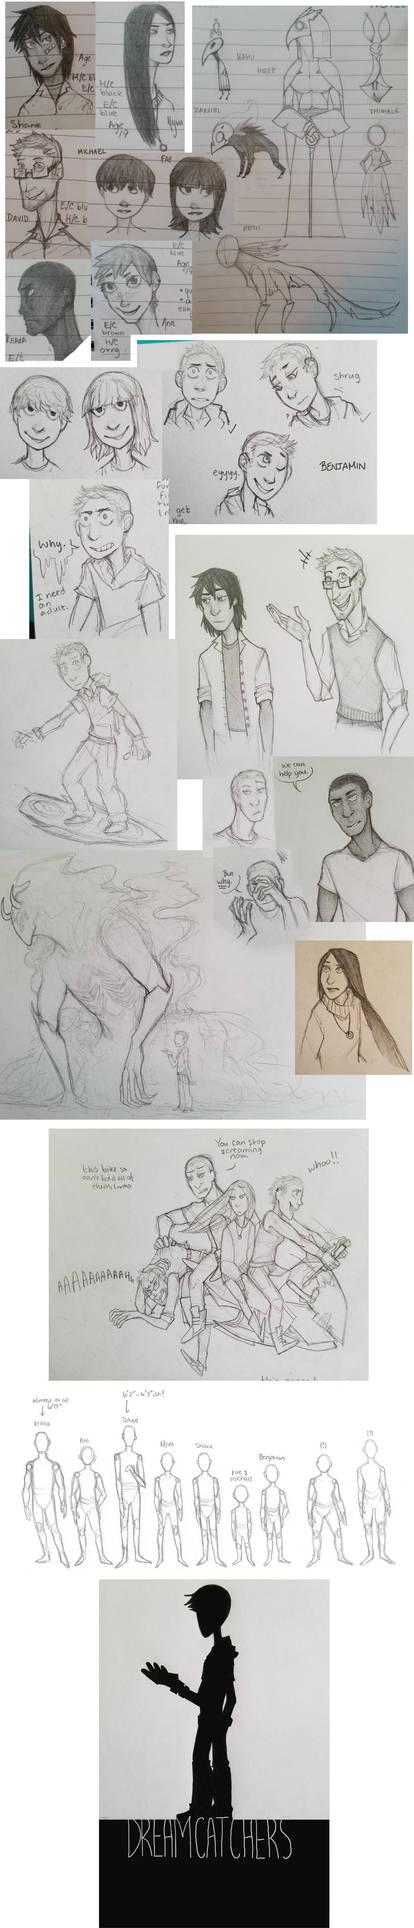 [Dreamcatchers] sketchdump